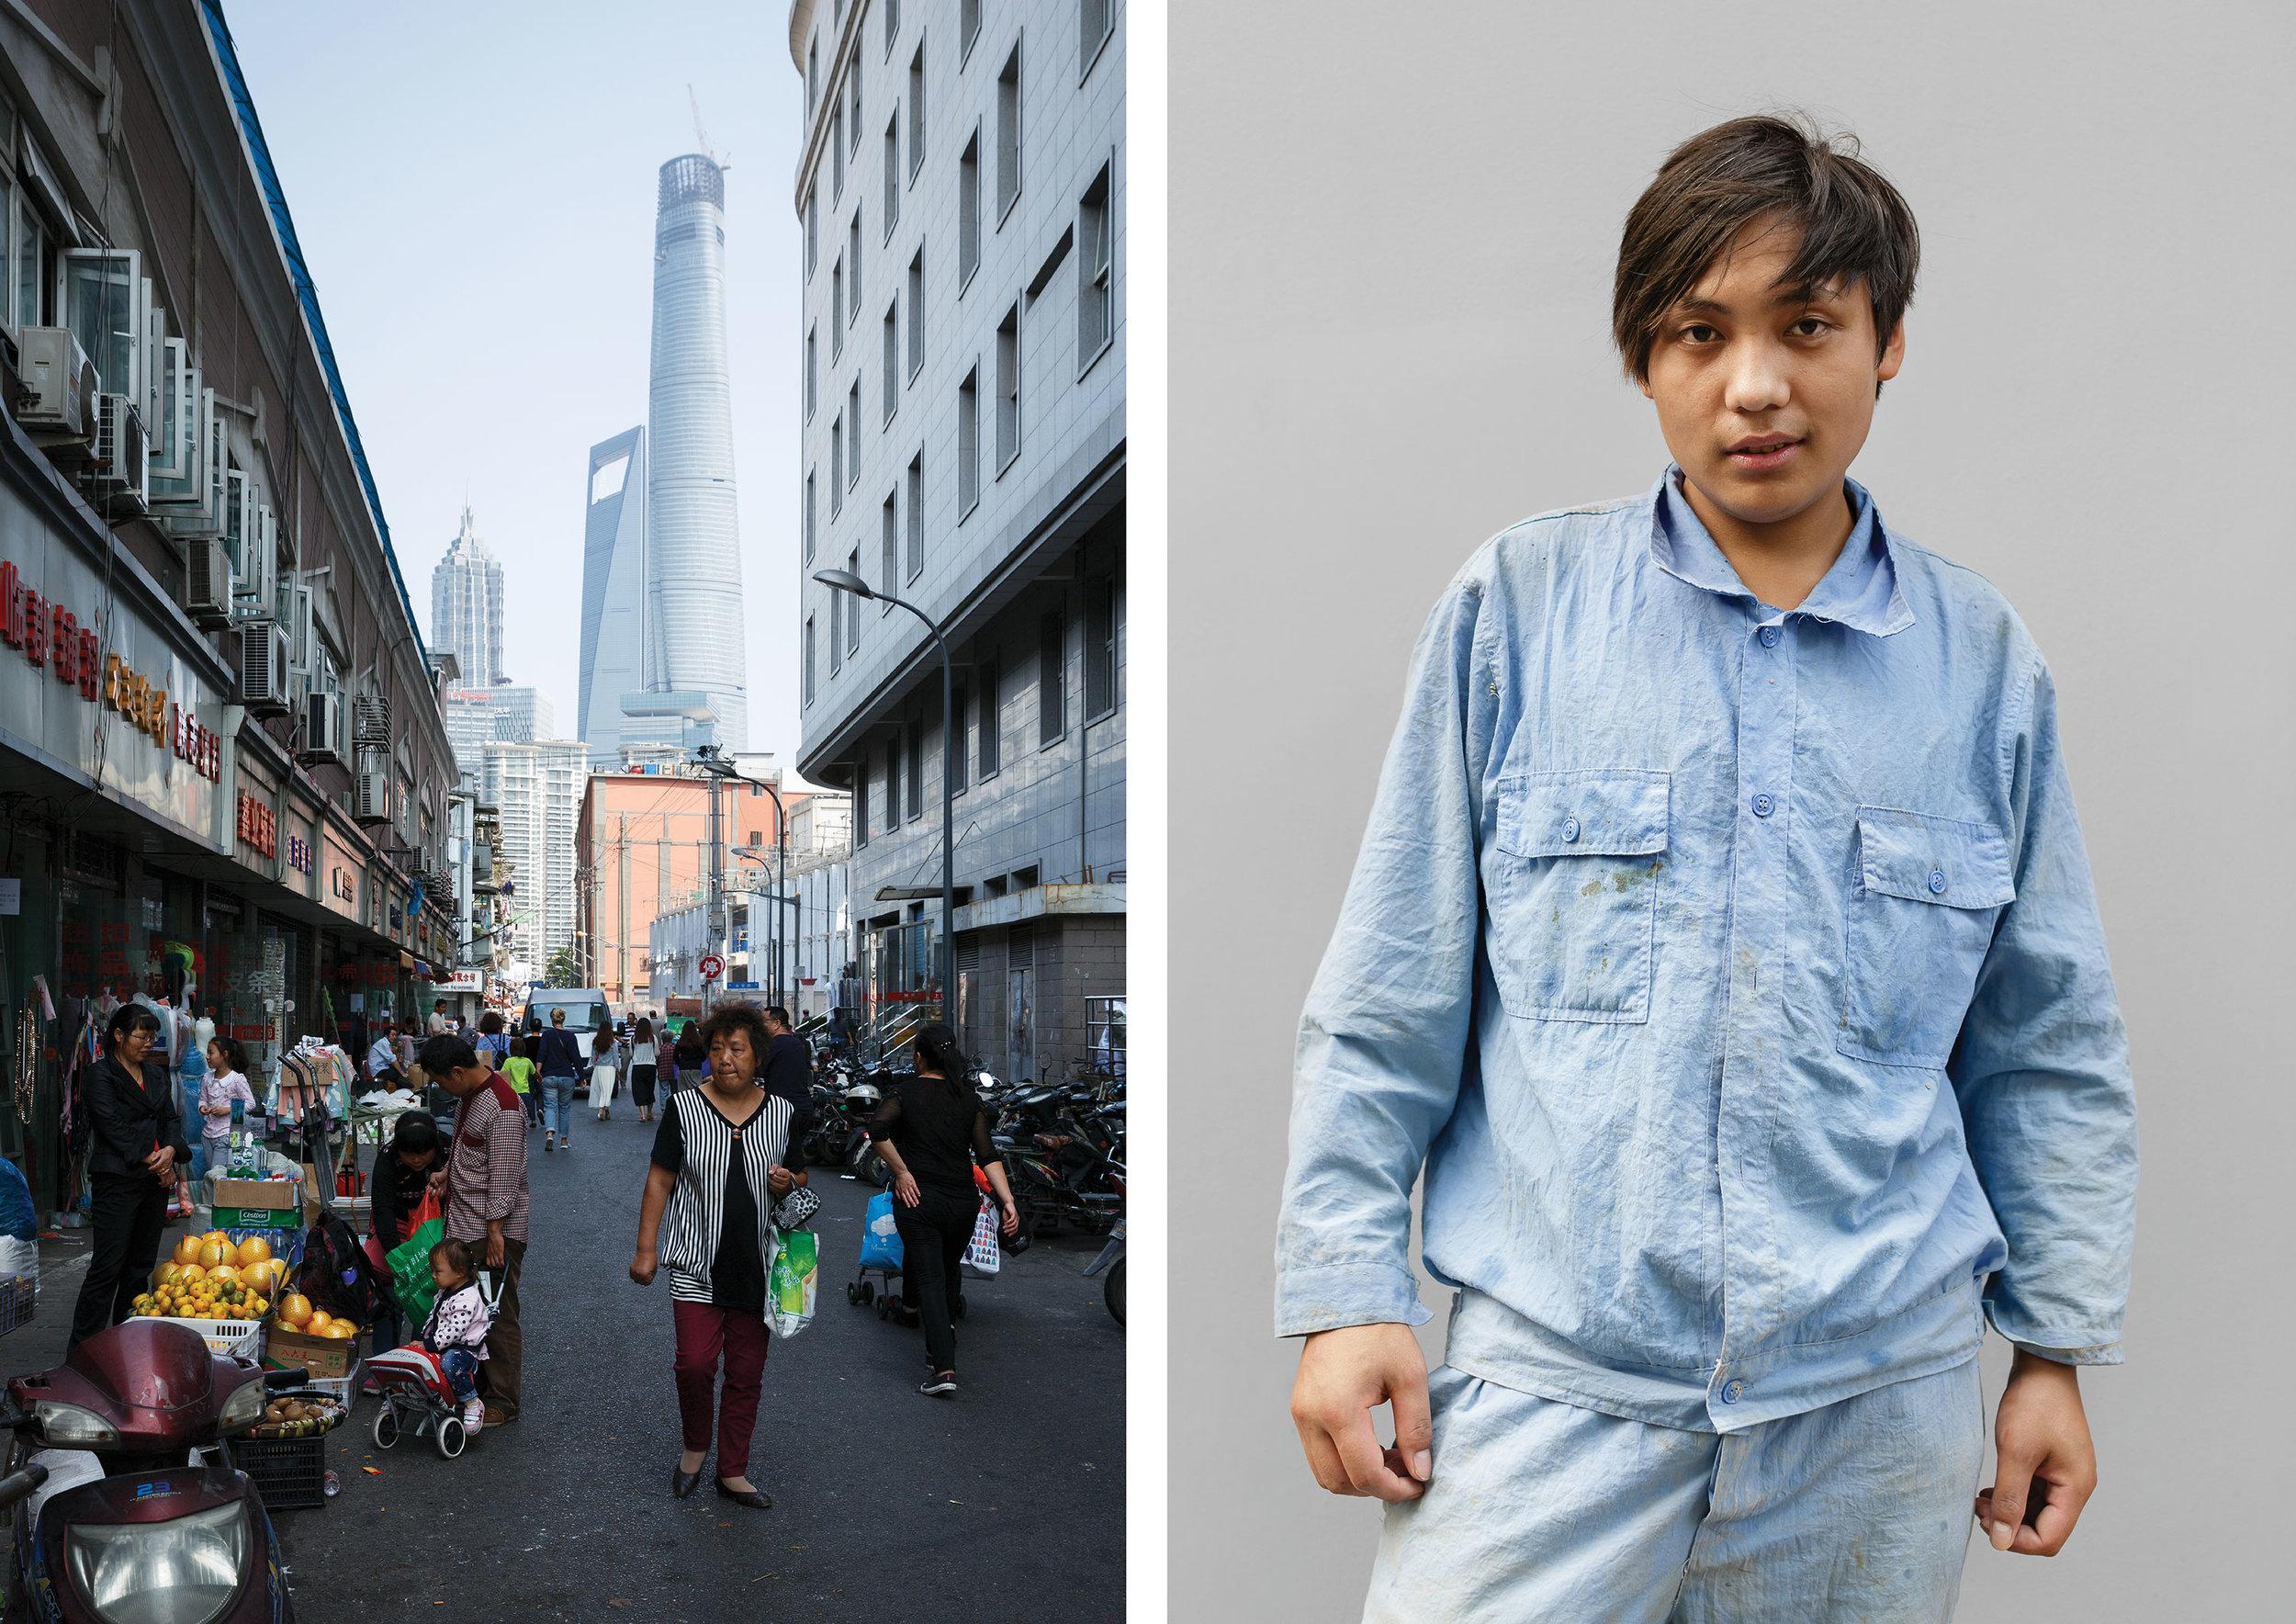 Shanghai_Tower-workers-and-building16.jpg